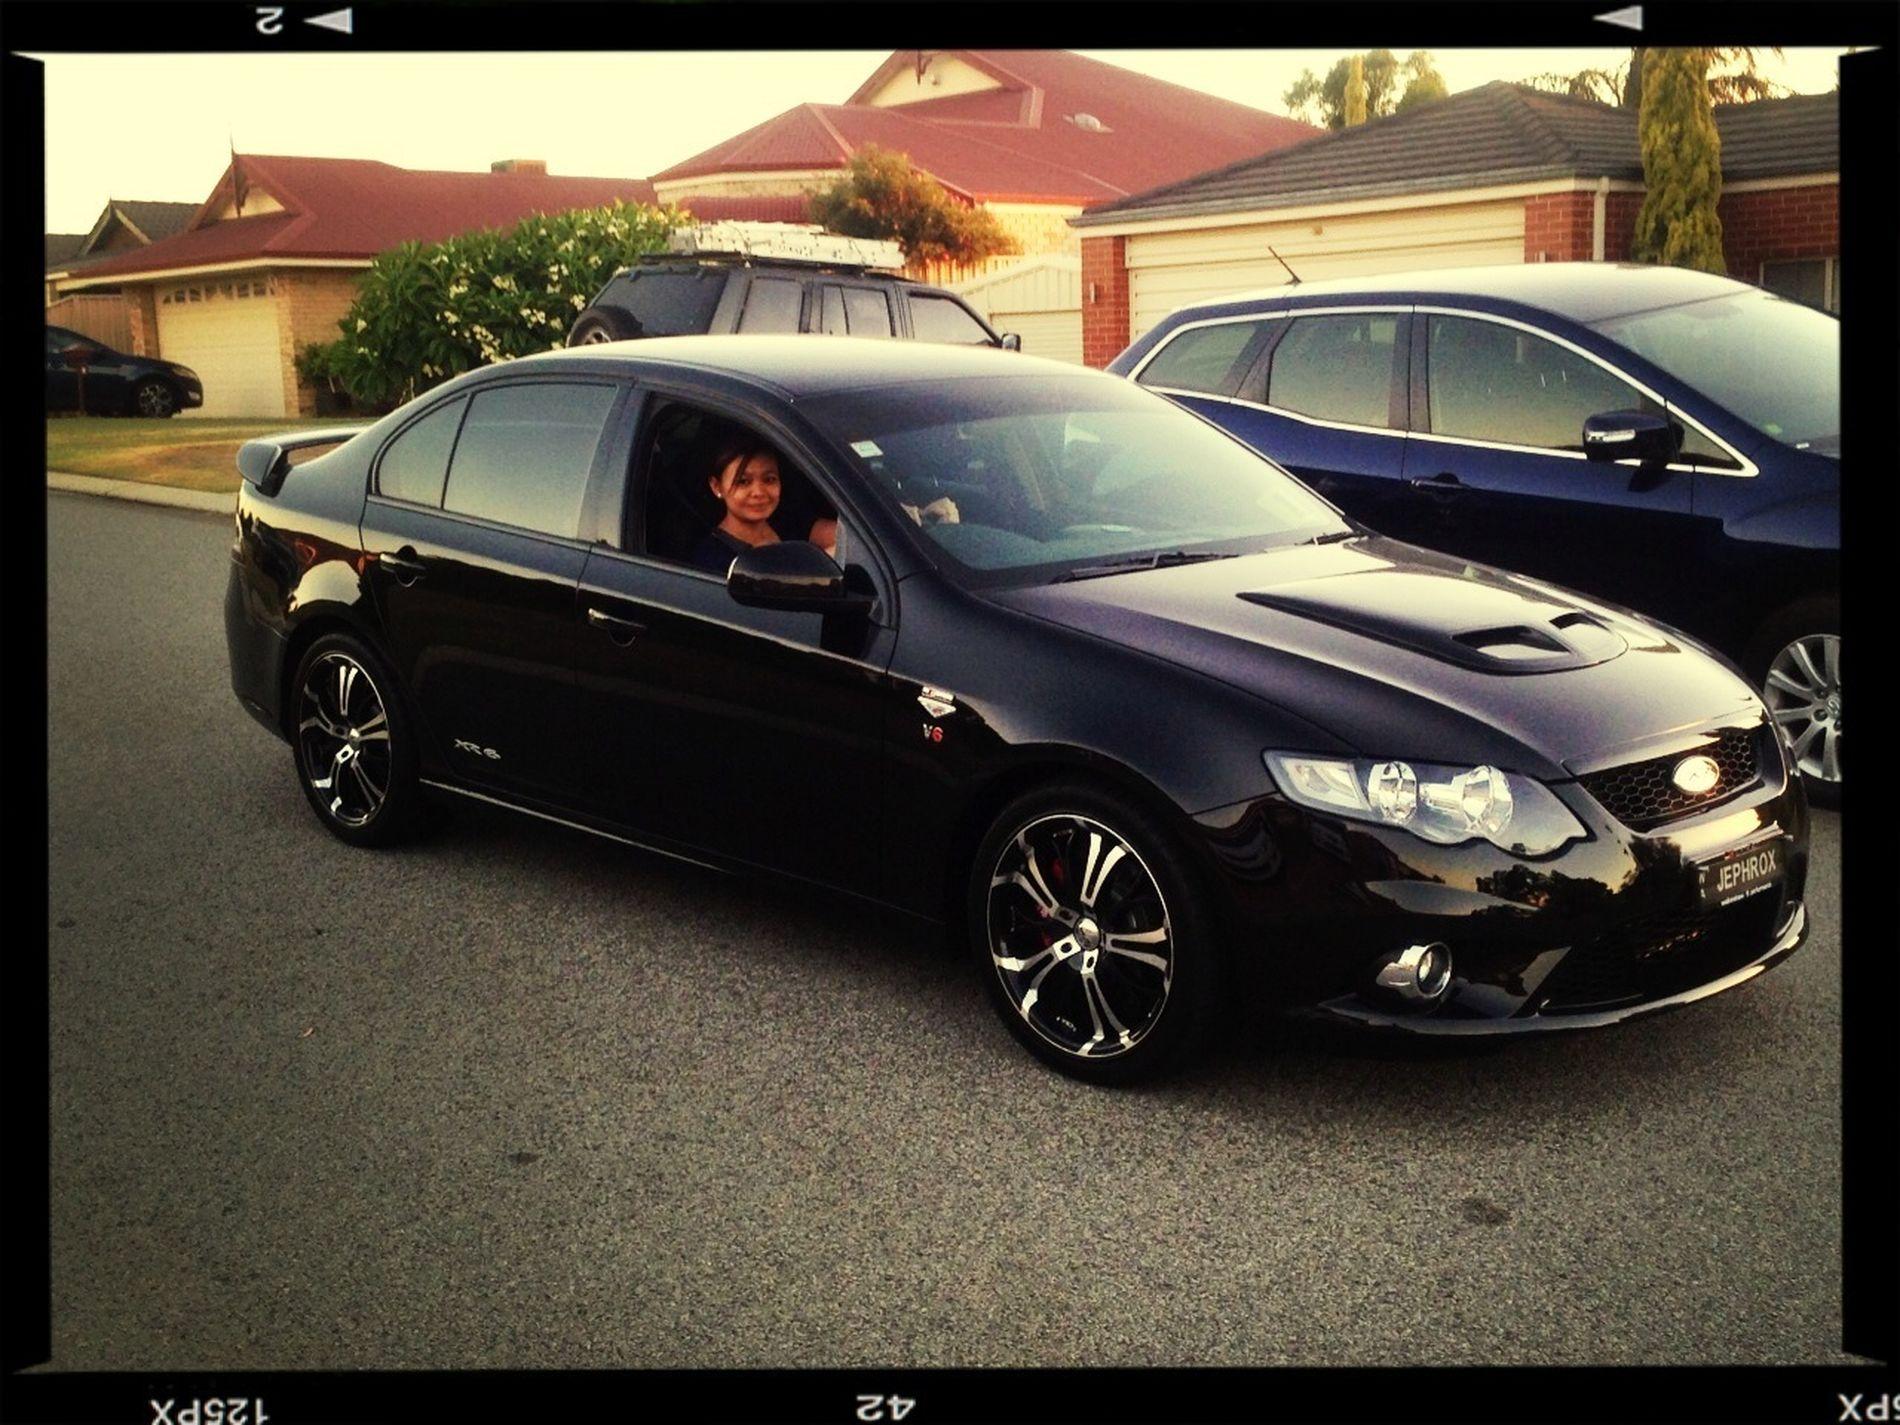 Baby U Can Drive My Car ;)